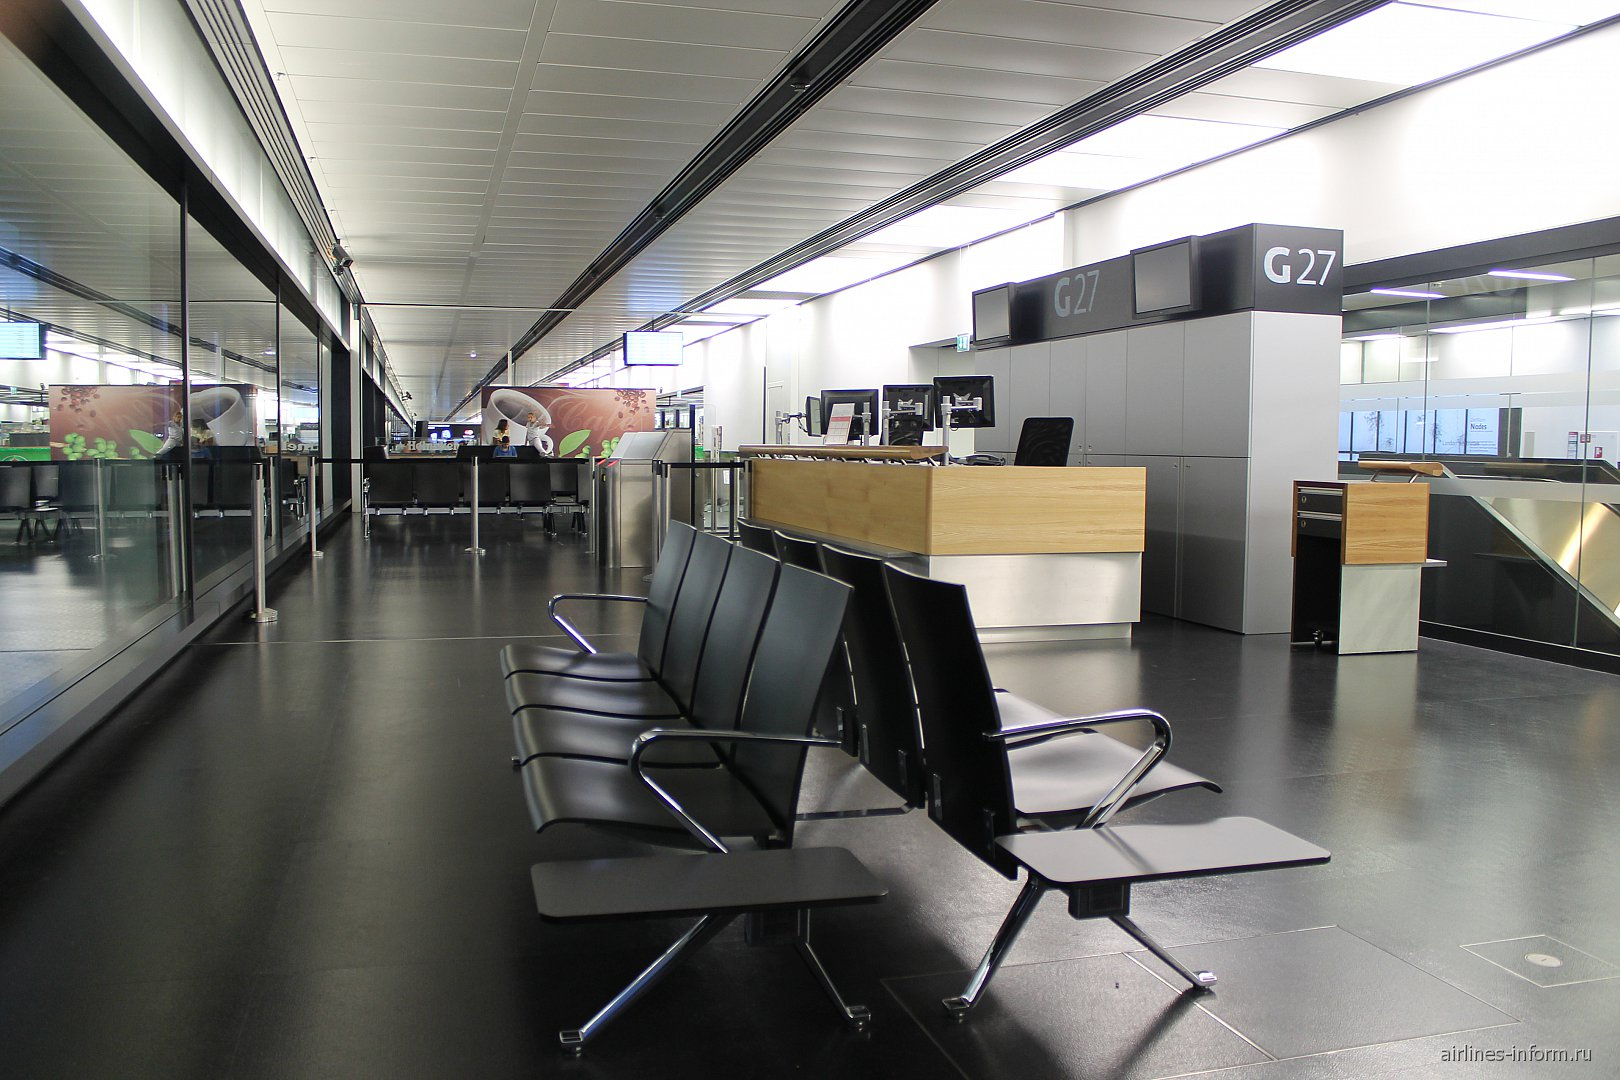 Выход на посадку в аэропорту Вены